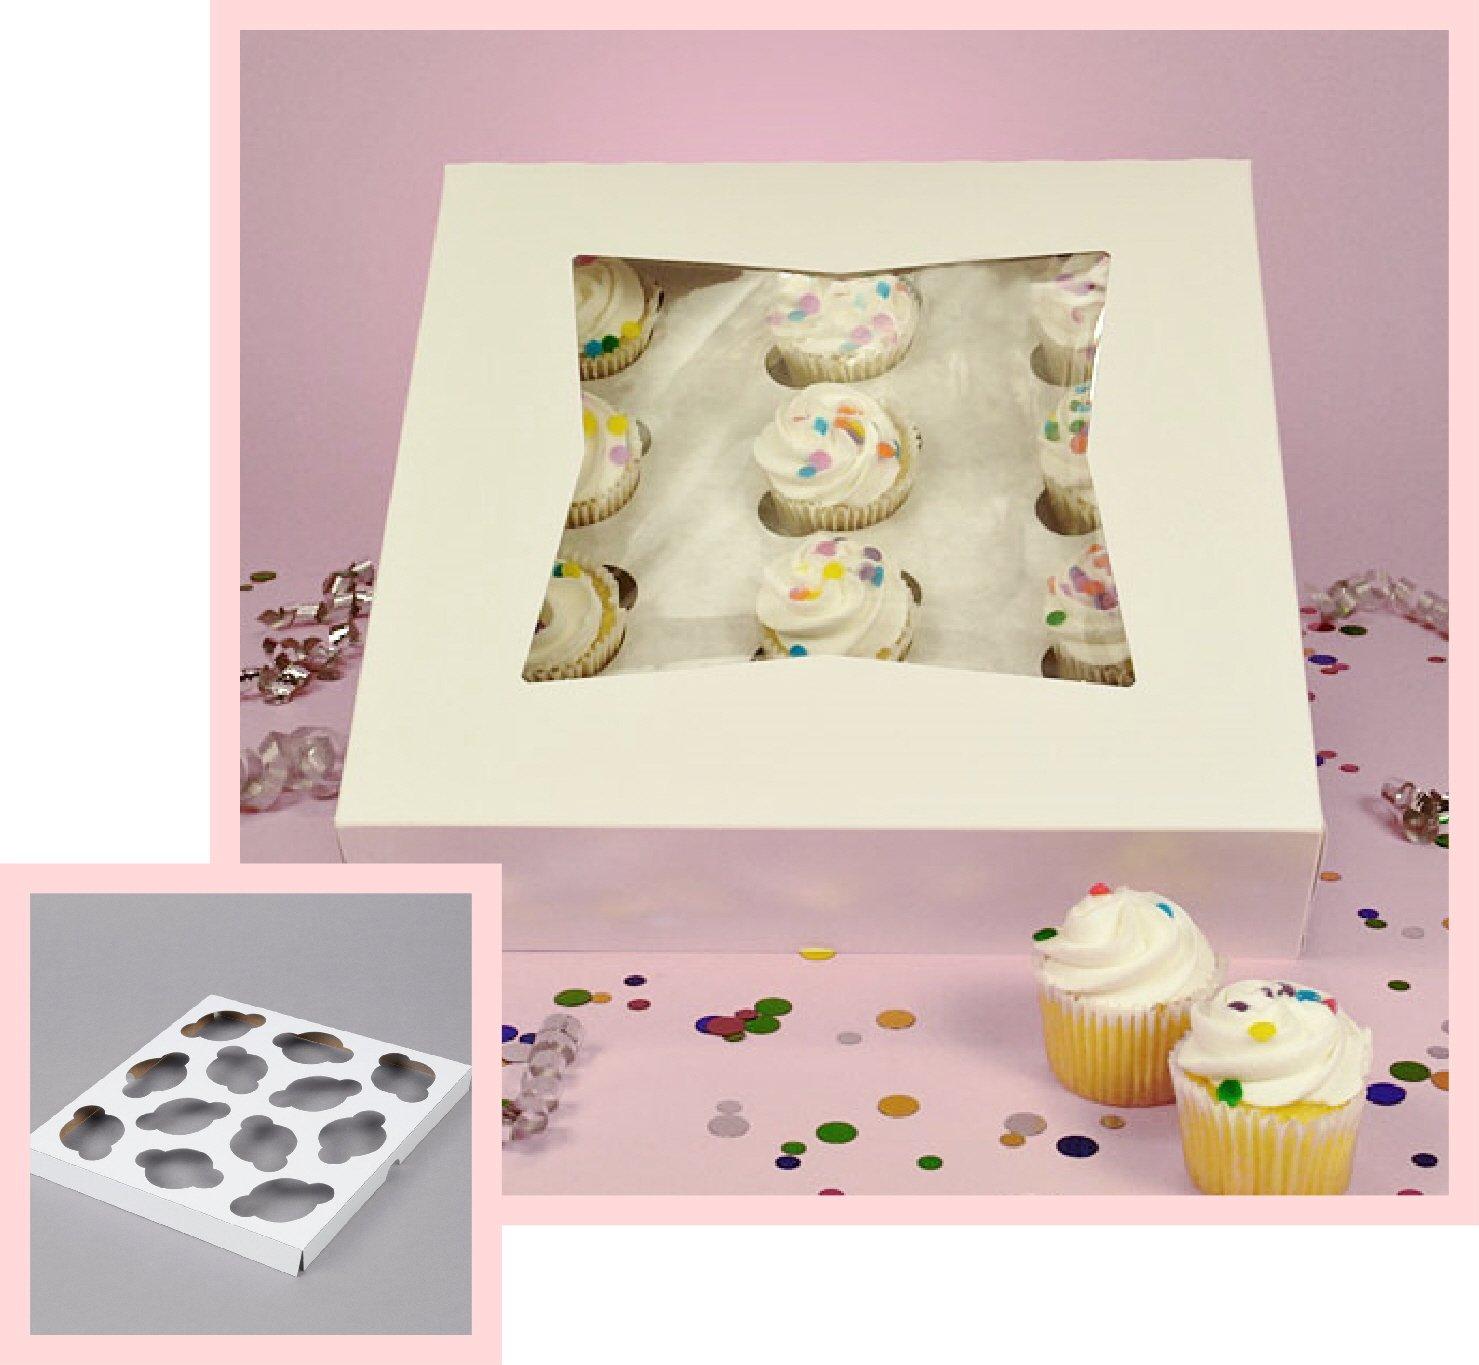 Pack of 10 Window Mini Cupcake Box 9 x 9 x 2 1/2'' and Inserts w/Signature Party Picks